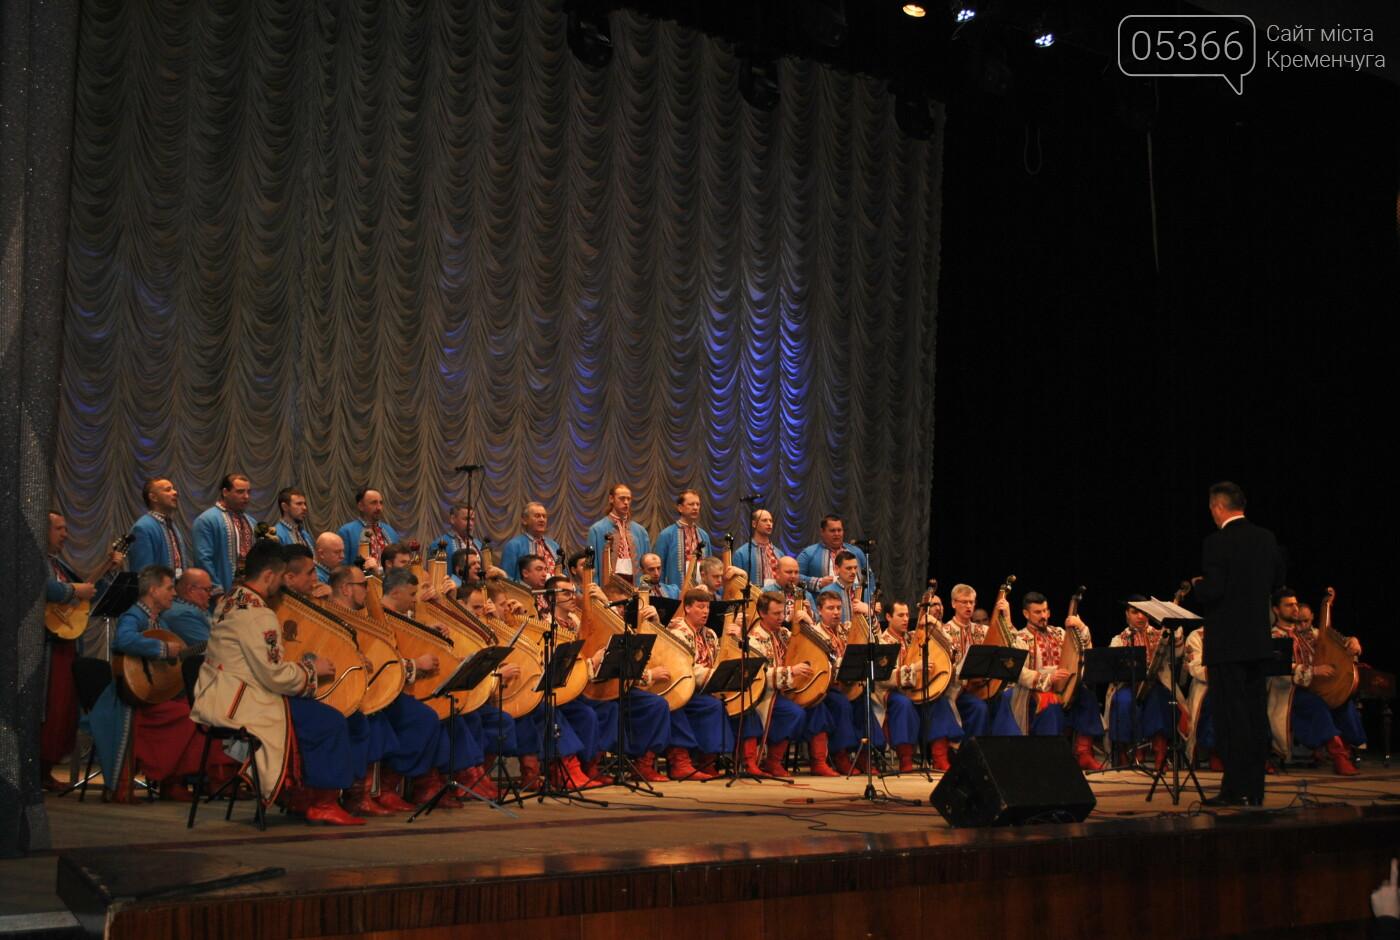 Бандуристи покорили кременчужан своїми виступами та музикою. Фото, фото-1